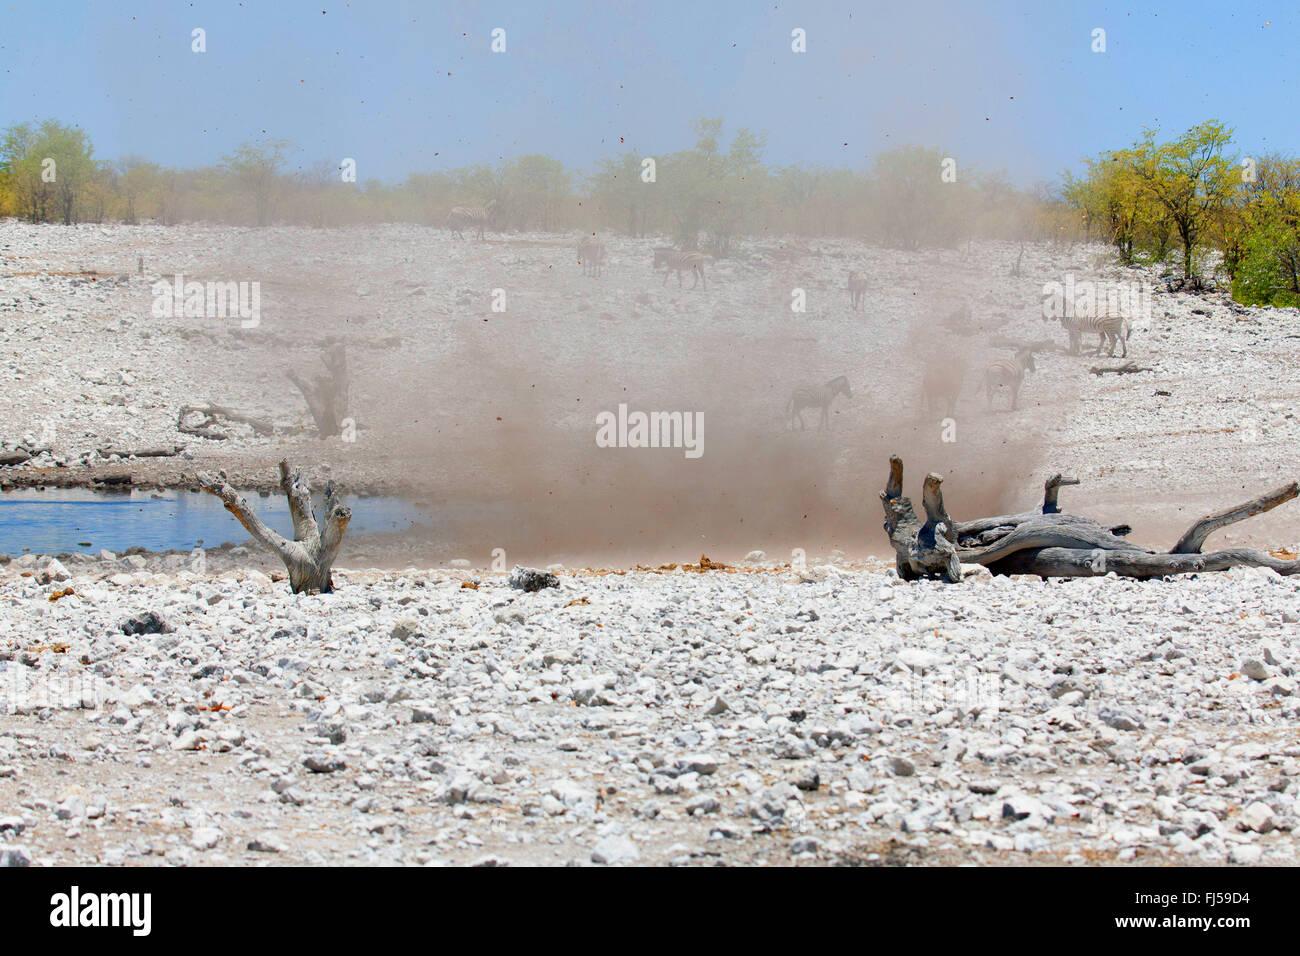 dust devil whirling up sand and stones near a waterhole with zebras, Namibia, Etosha National Park, Naumutoni Stock Photo